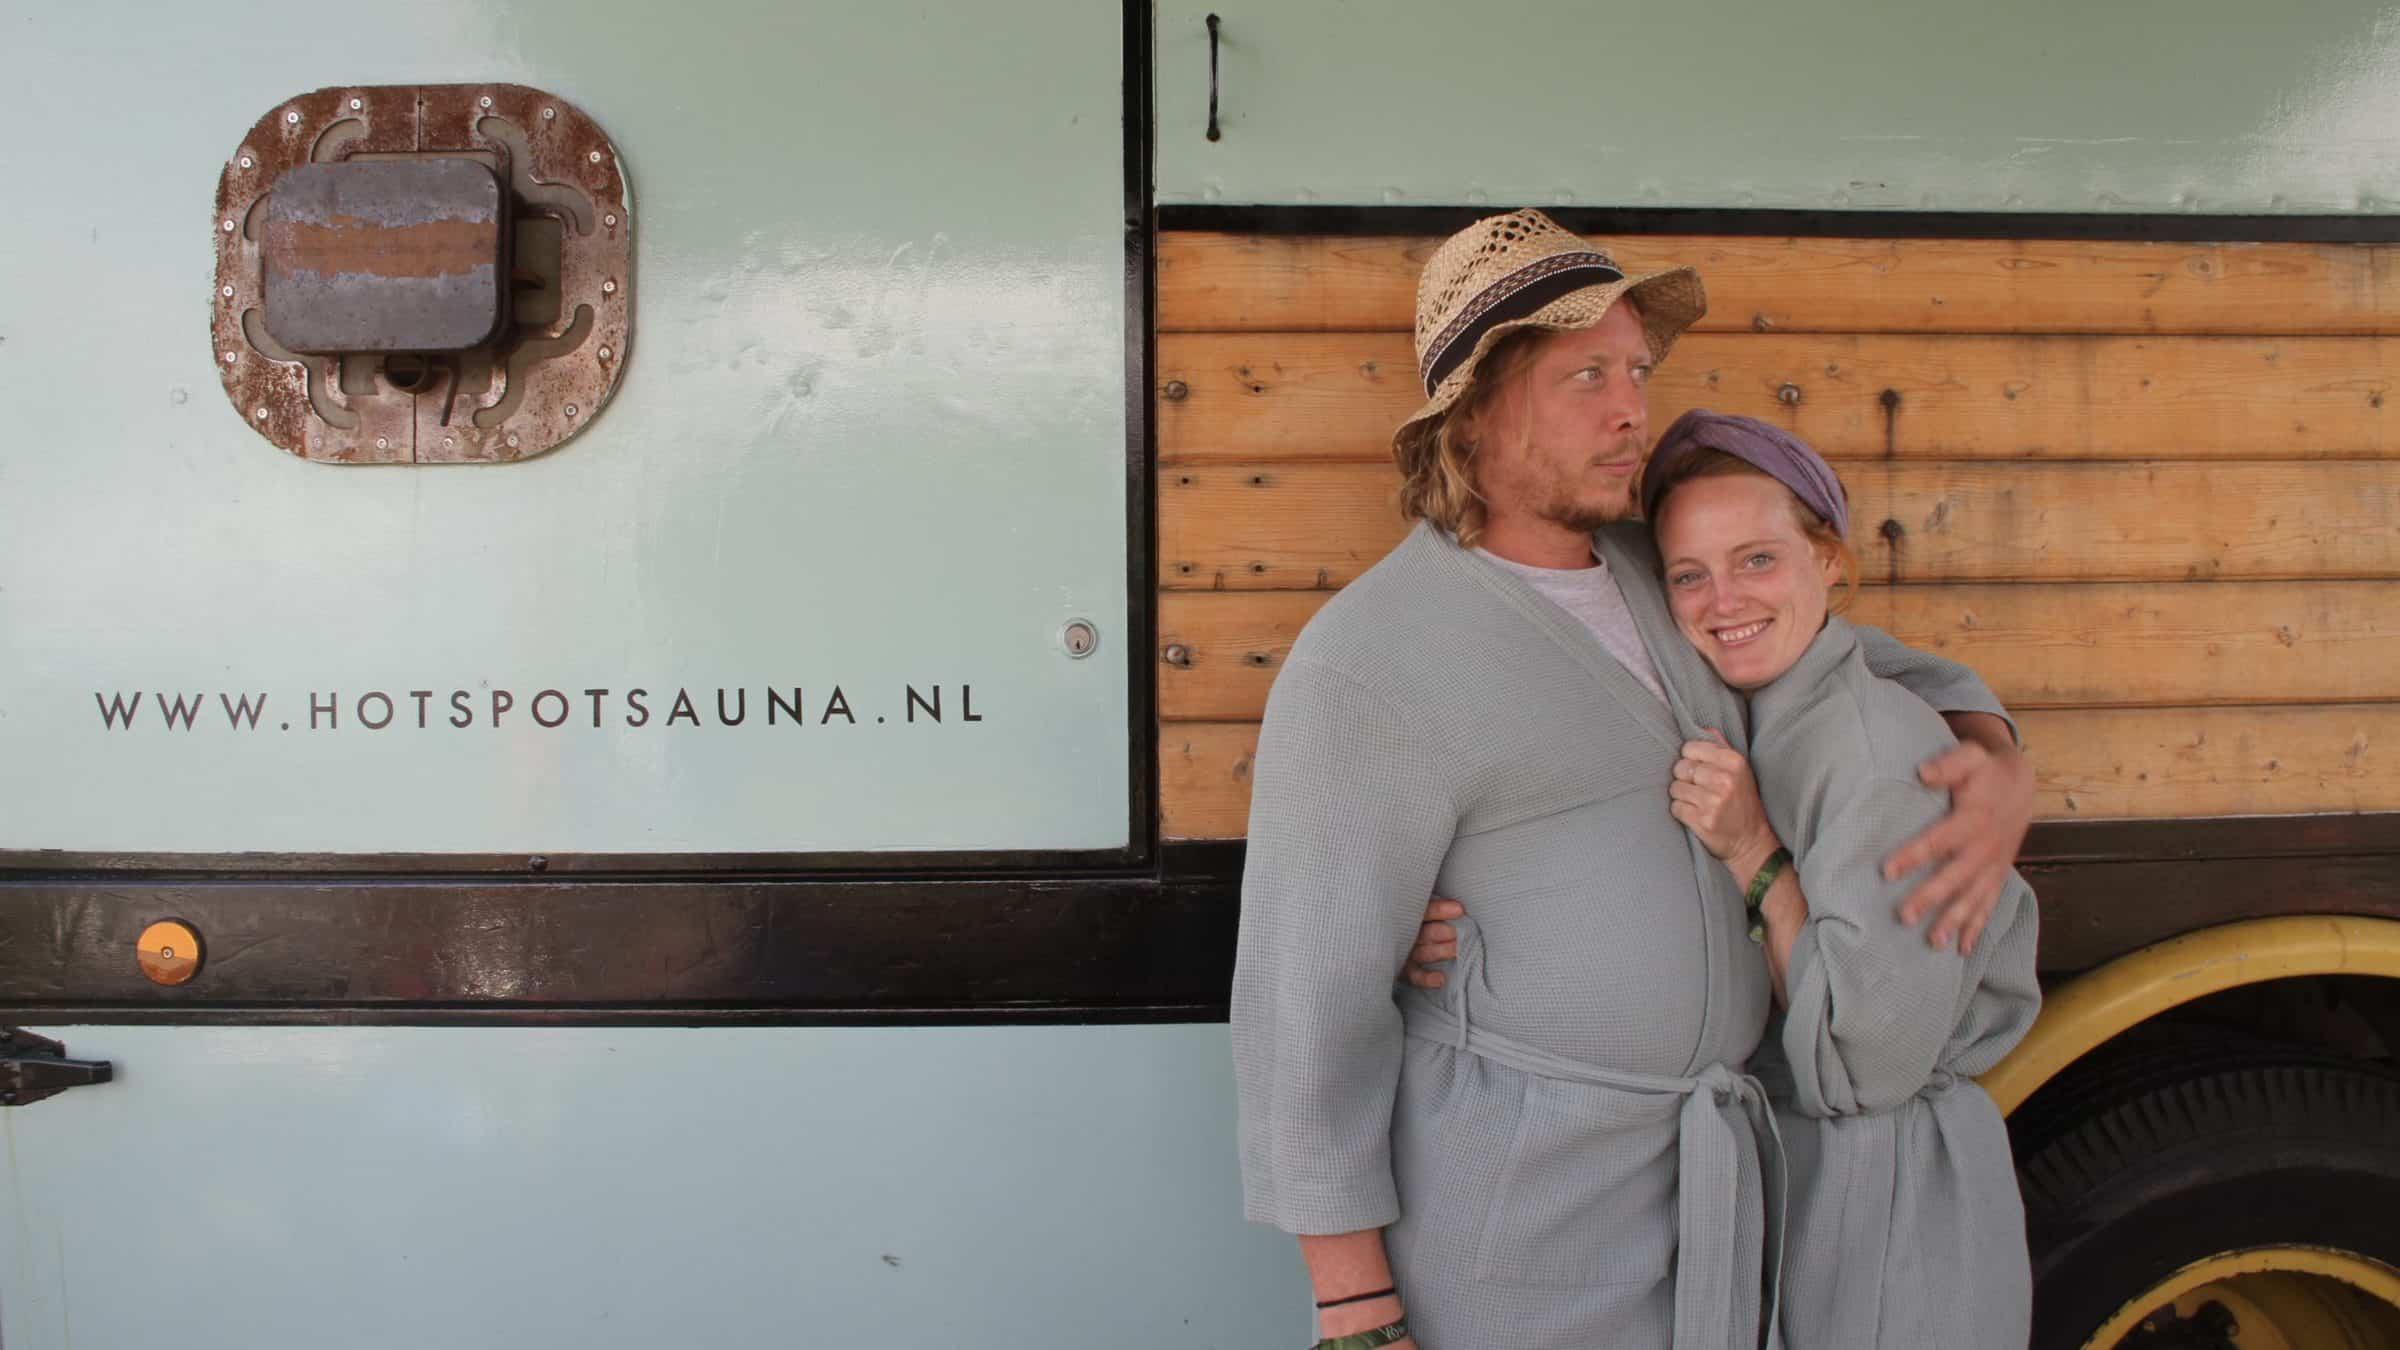 Hotspot - mobiele sauna - truck - mensen in badjas